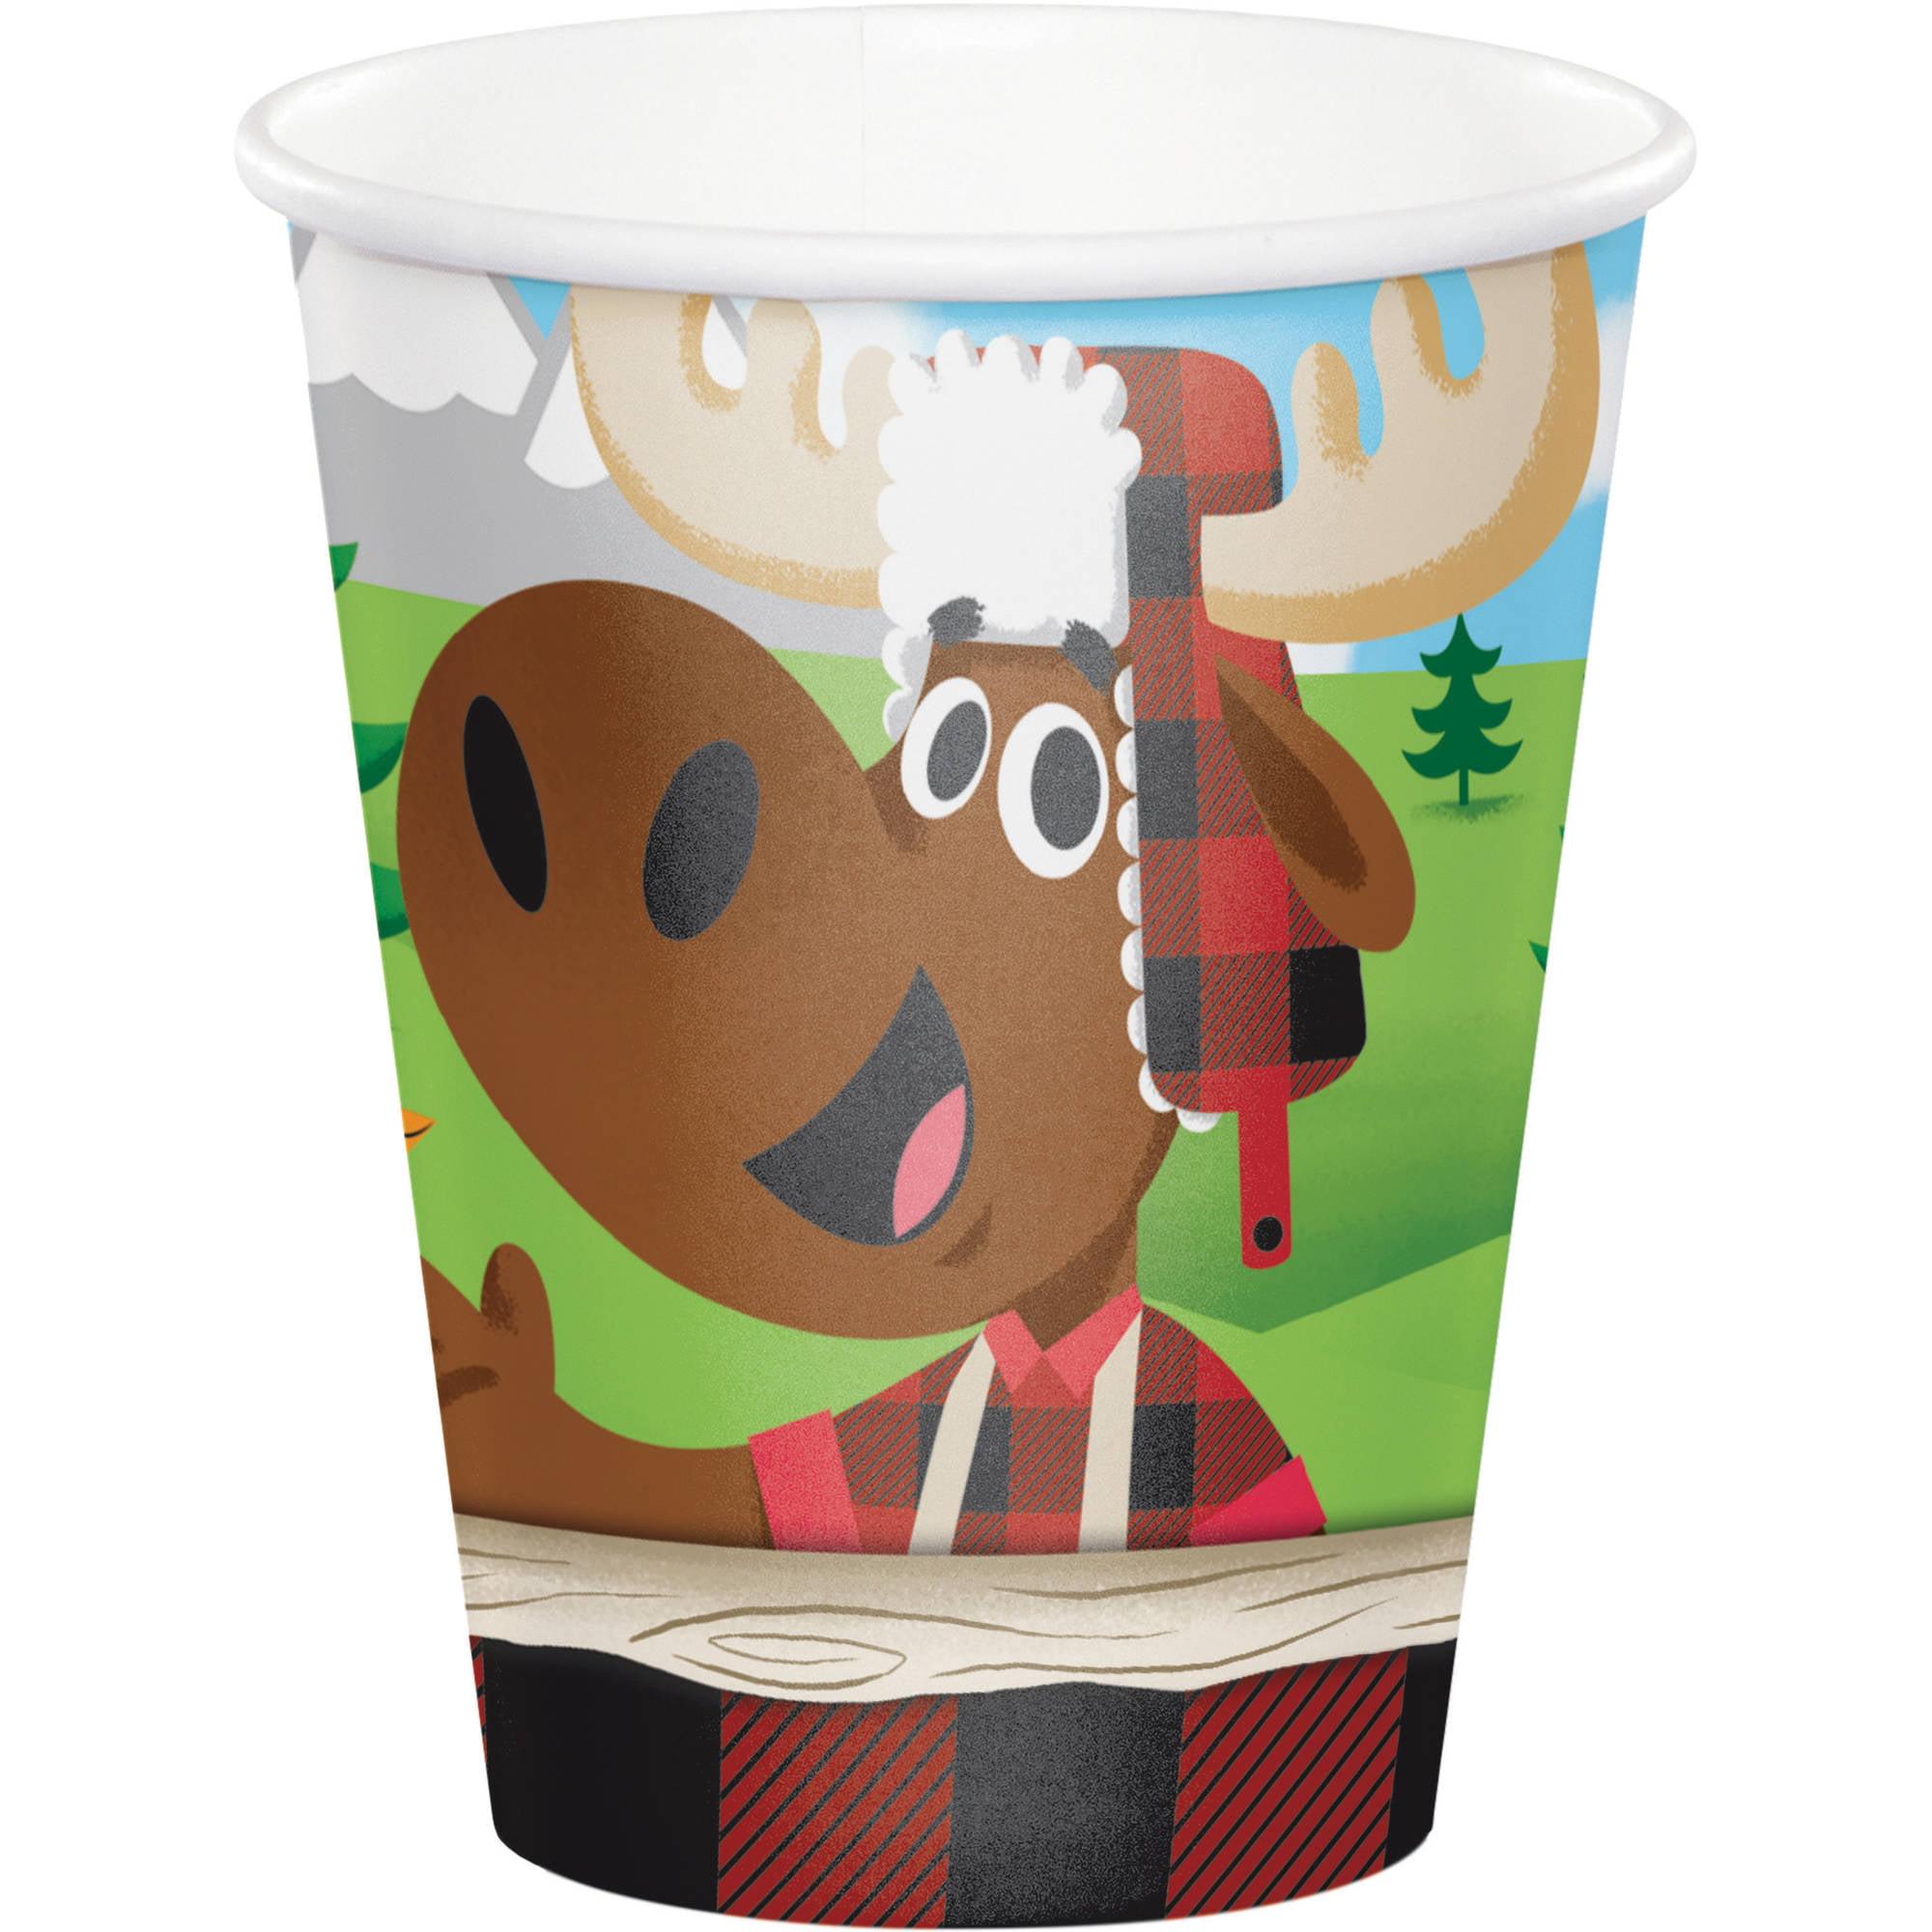 Lum-Bear-Jack Cups, 8-Pack